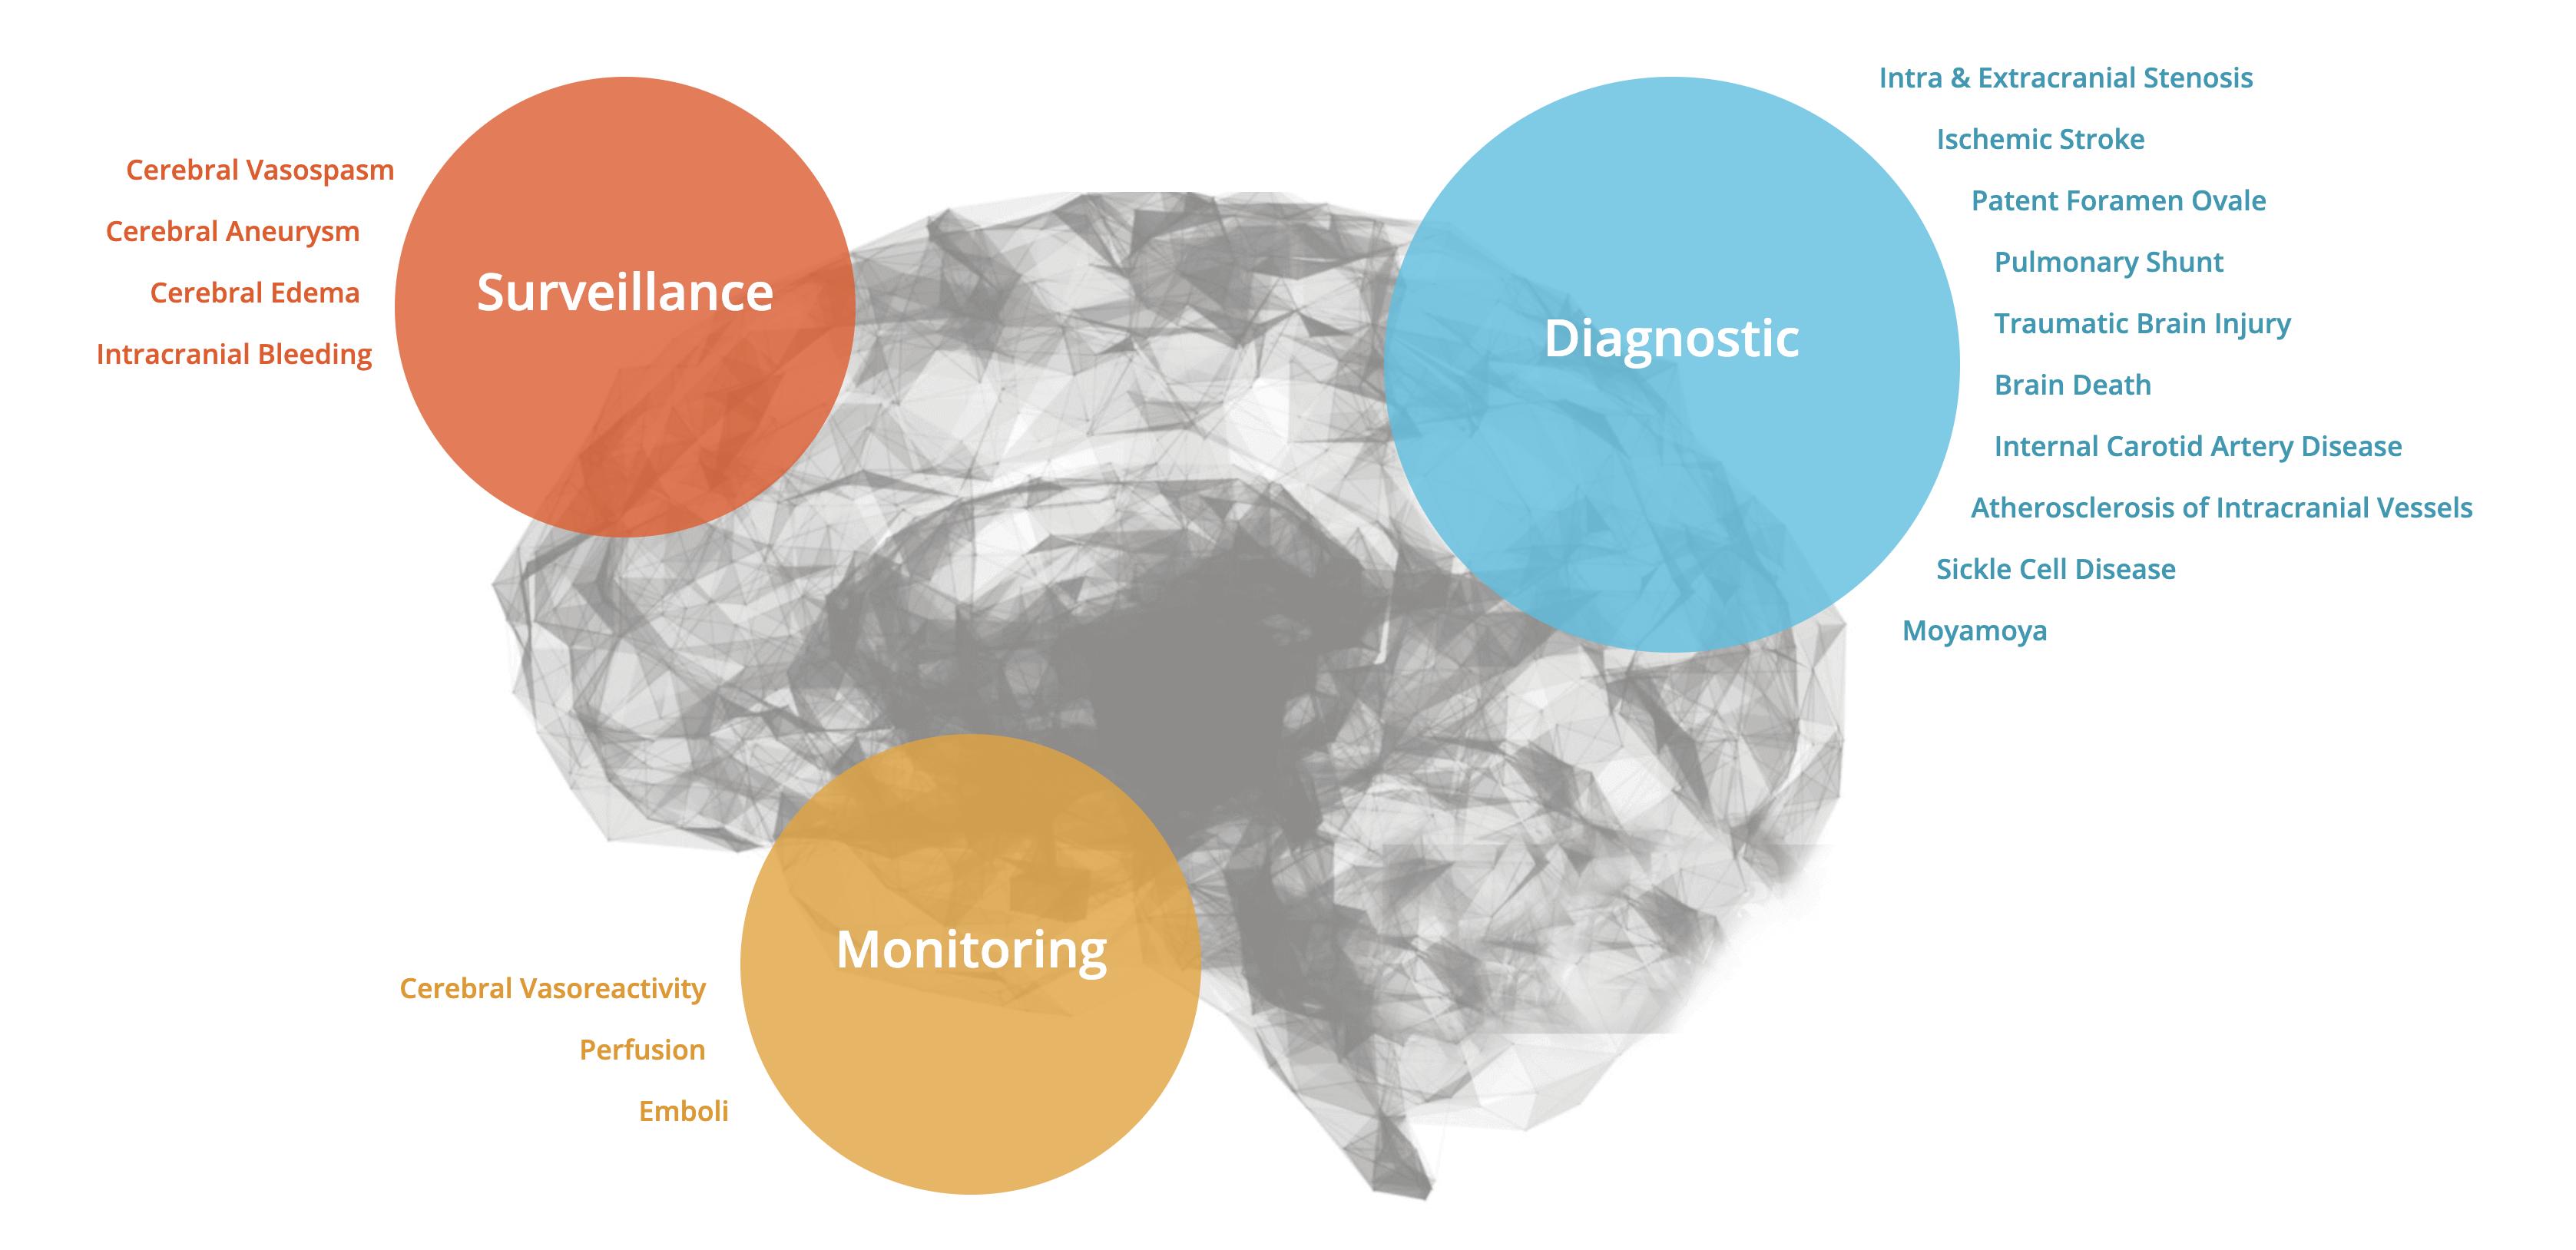 A brain diagram with information regarding vasospasm, aneurysm, edema, brain bleeds, profusion, shunt, PFO, stroke and etc.